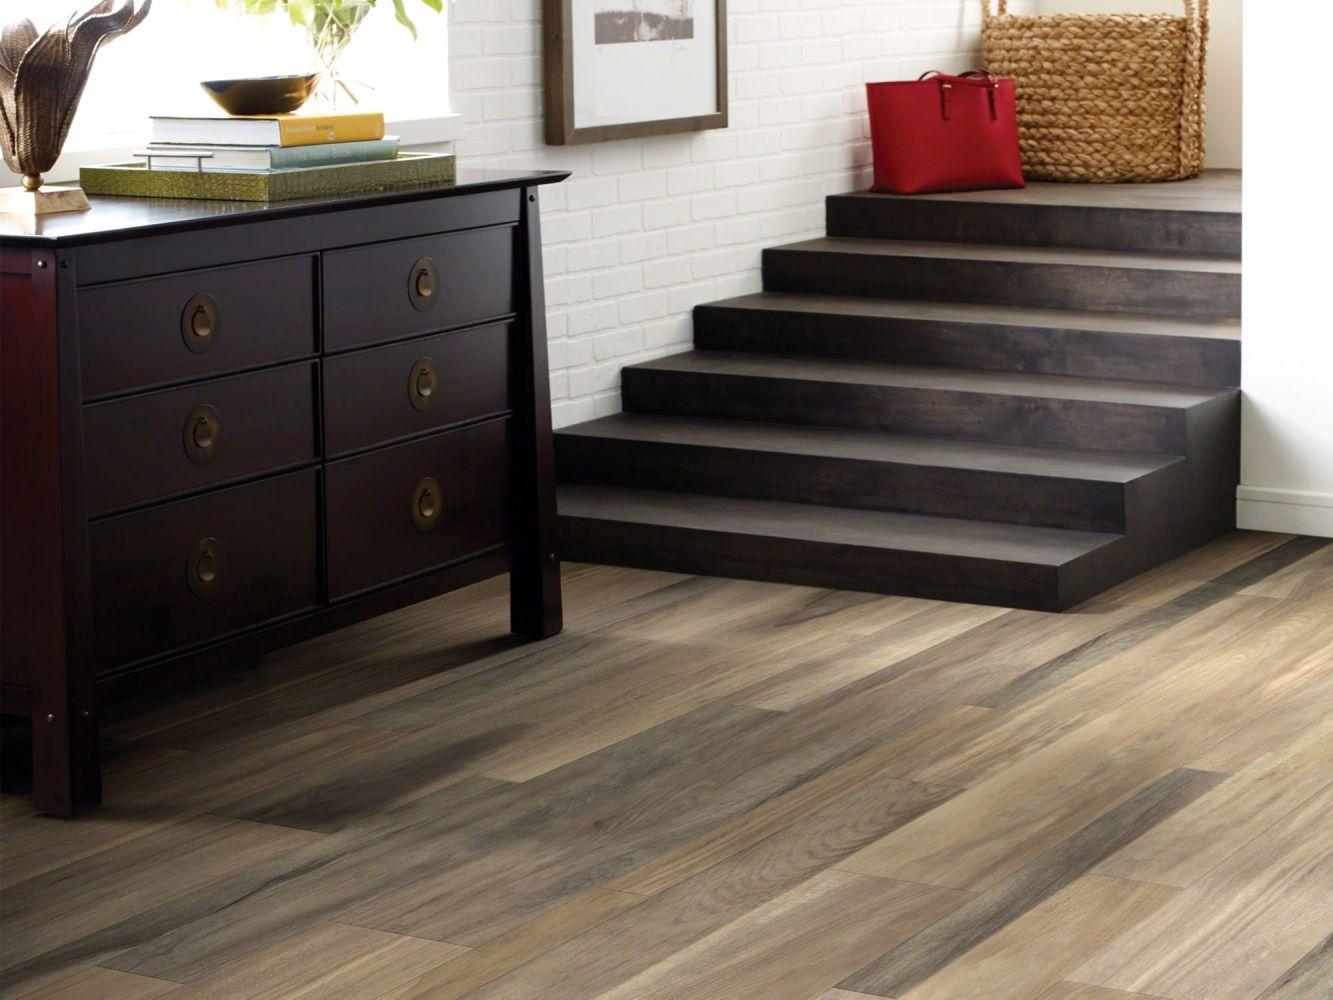 Shaw Floors SFA Largo Mix Plus Campania Jatoba 00131_501SA